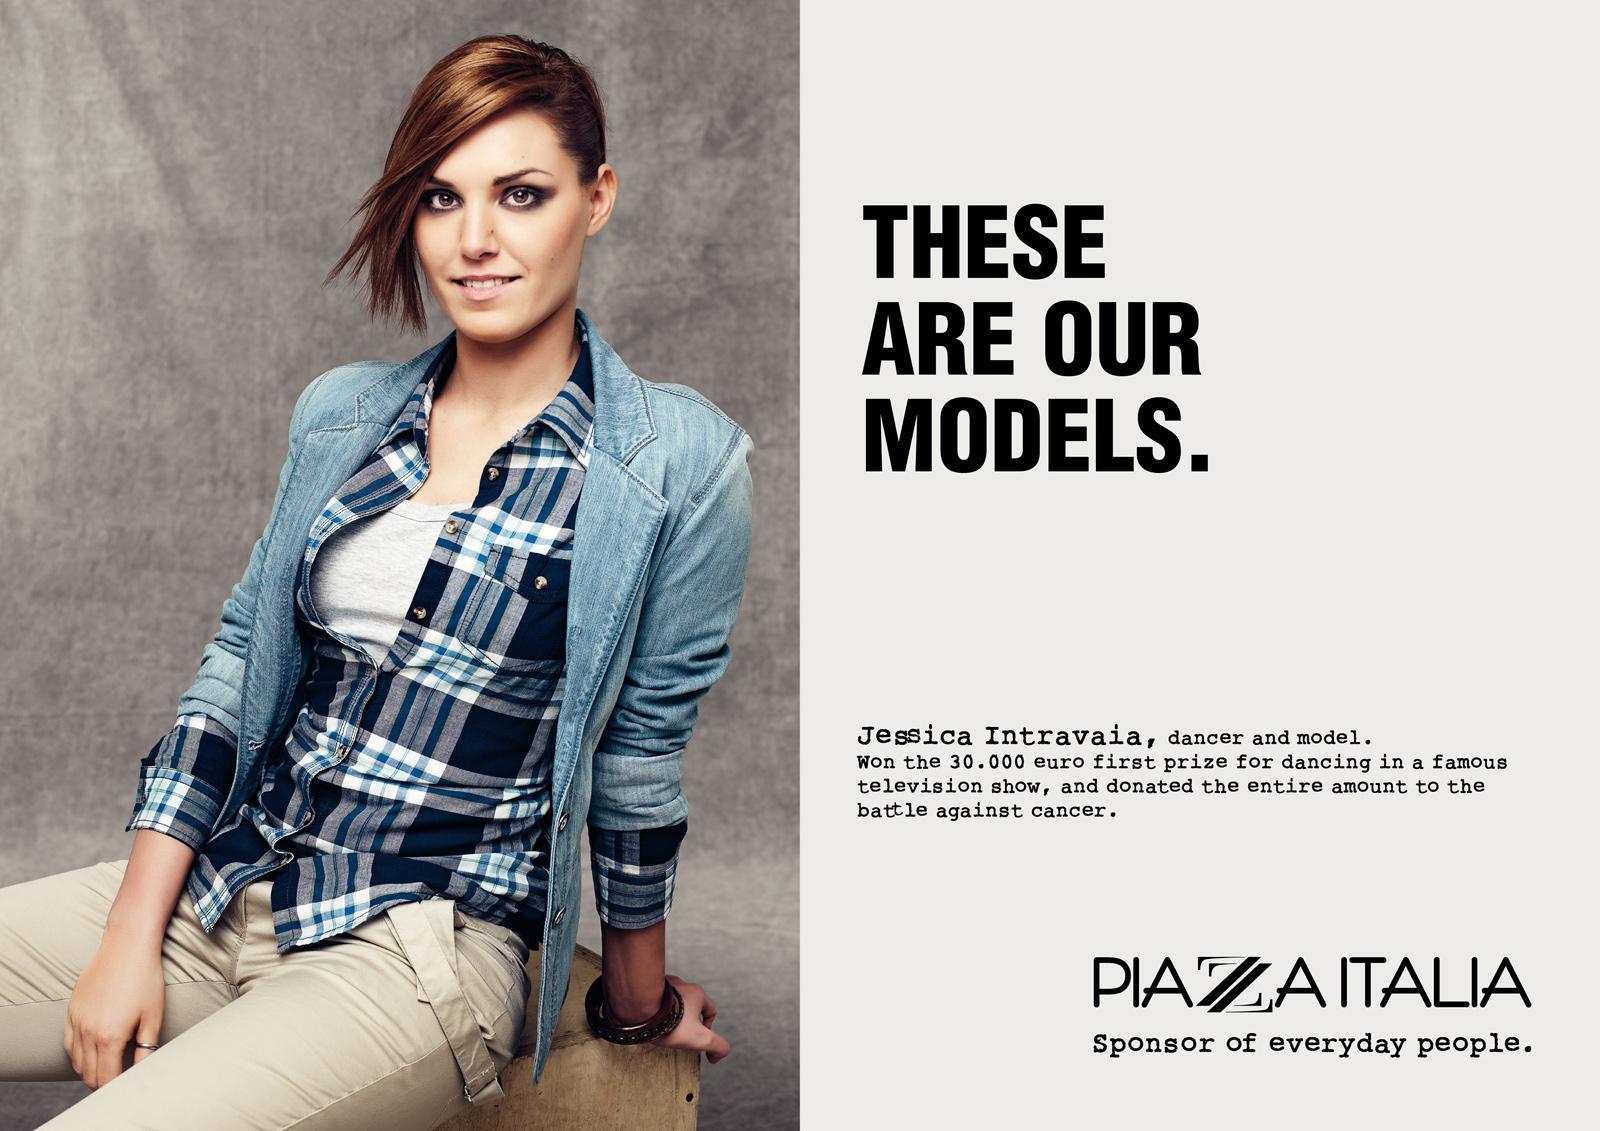 Piazza Italia Print Ad -  Our models, Intravaia